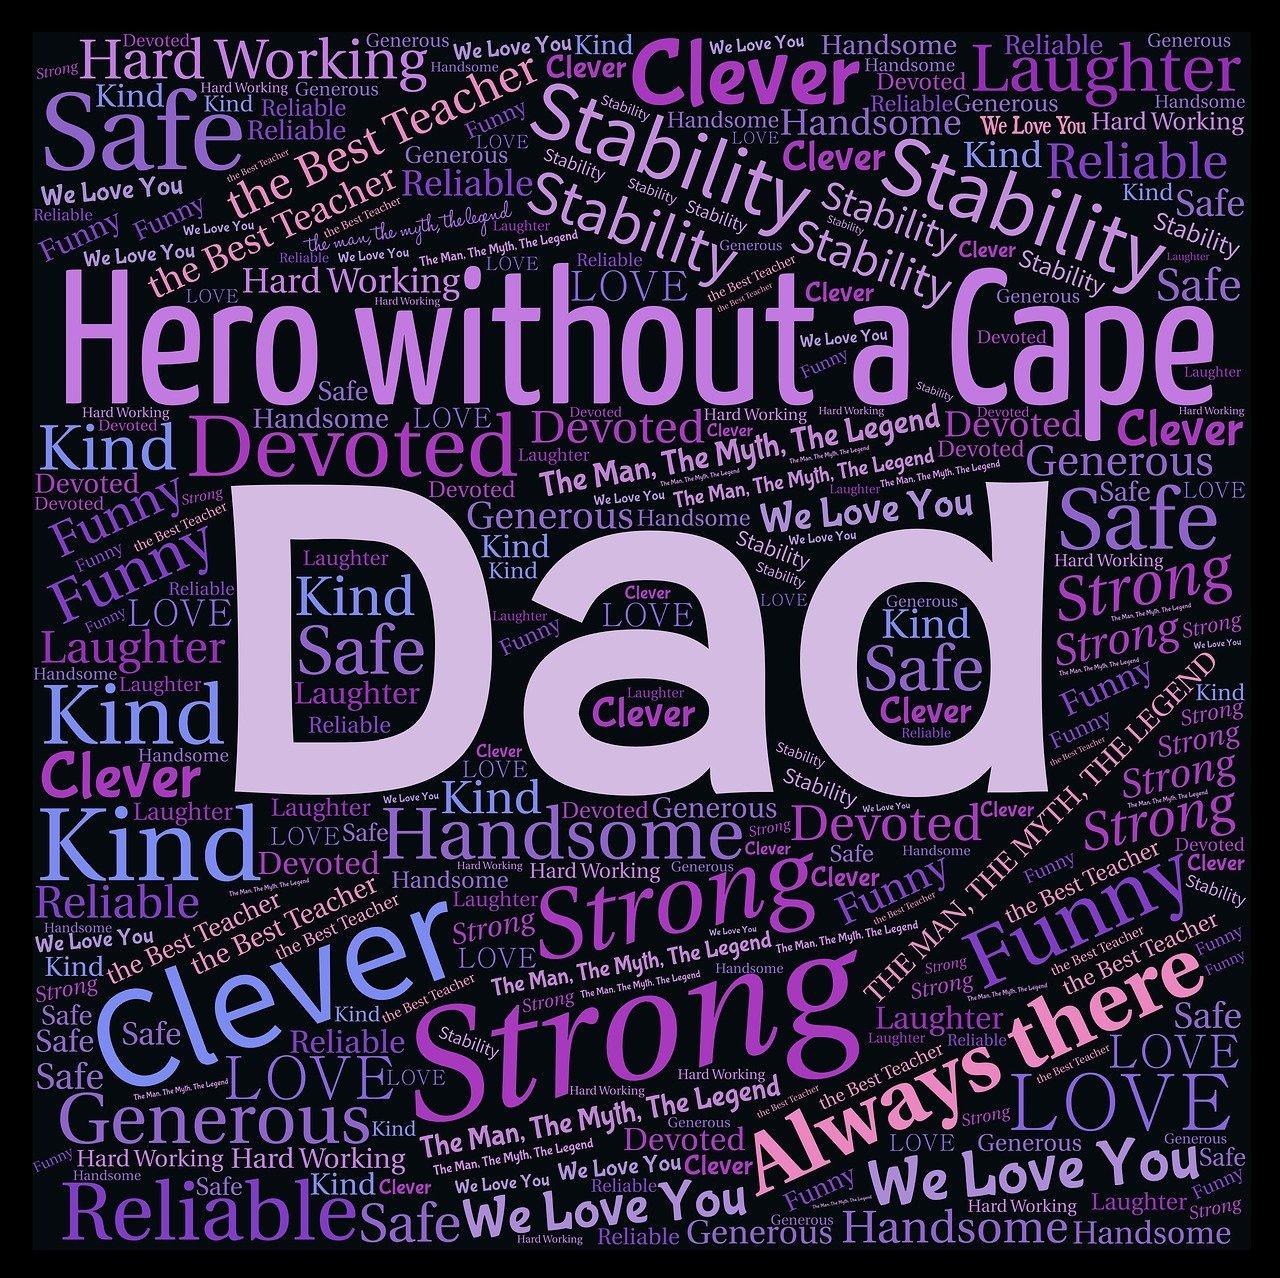 Father's Day 2021, honest fathers raise honest children